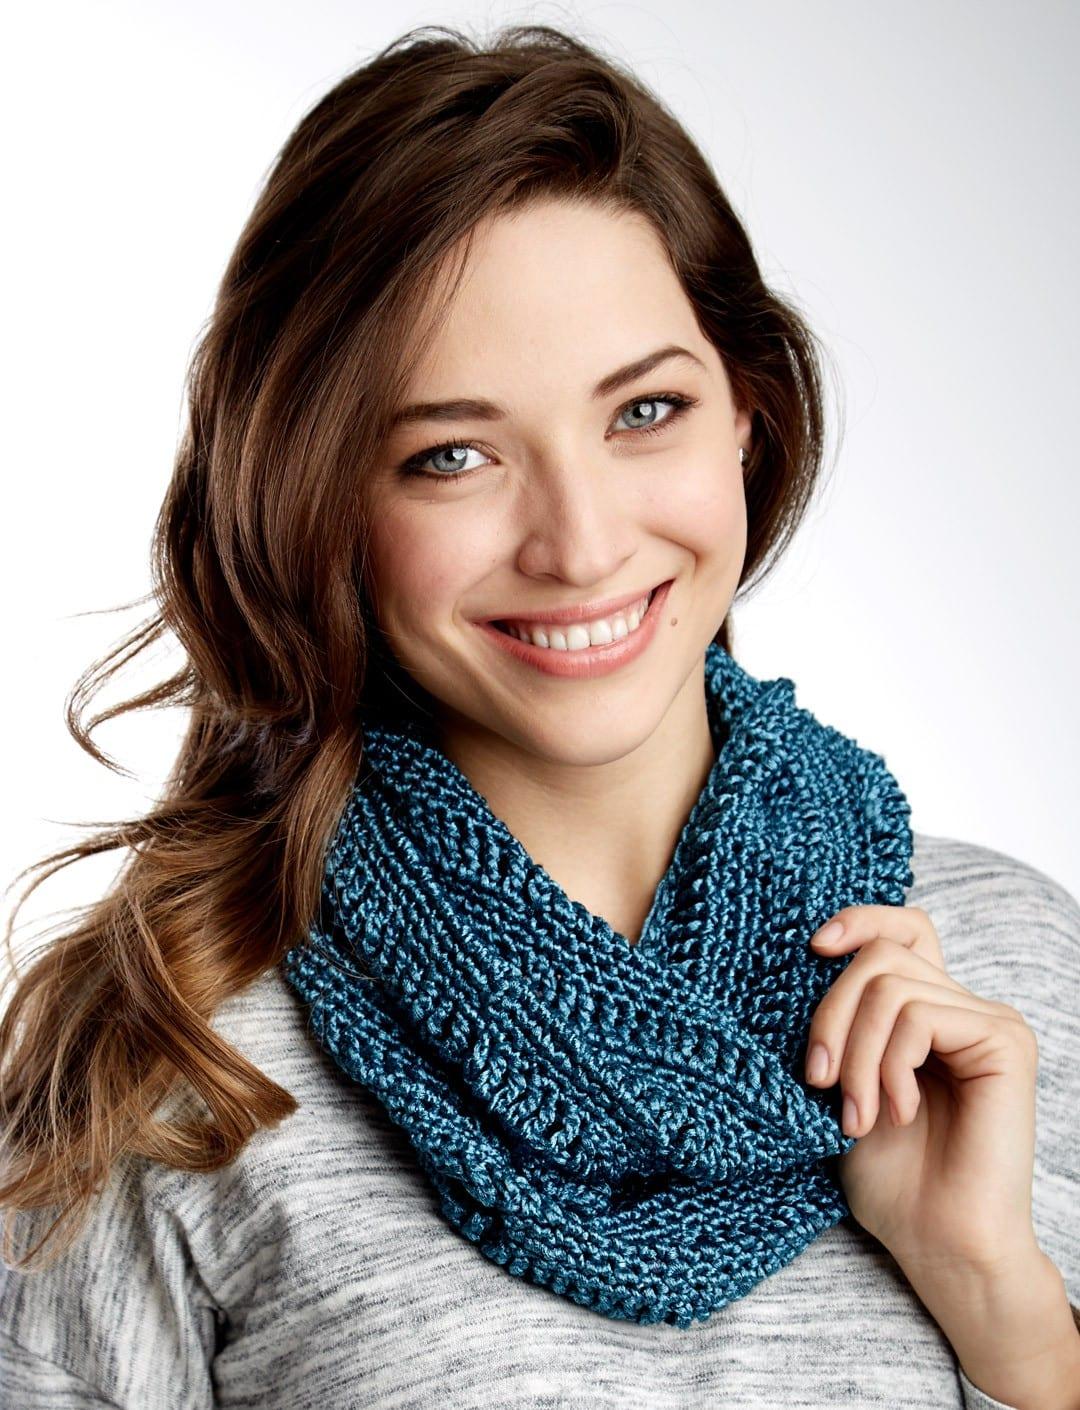 Crochet Scarf Patterns that Look Knit - Sewrella